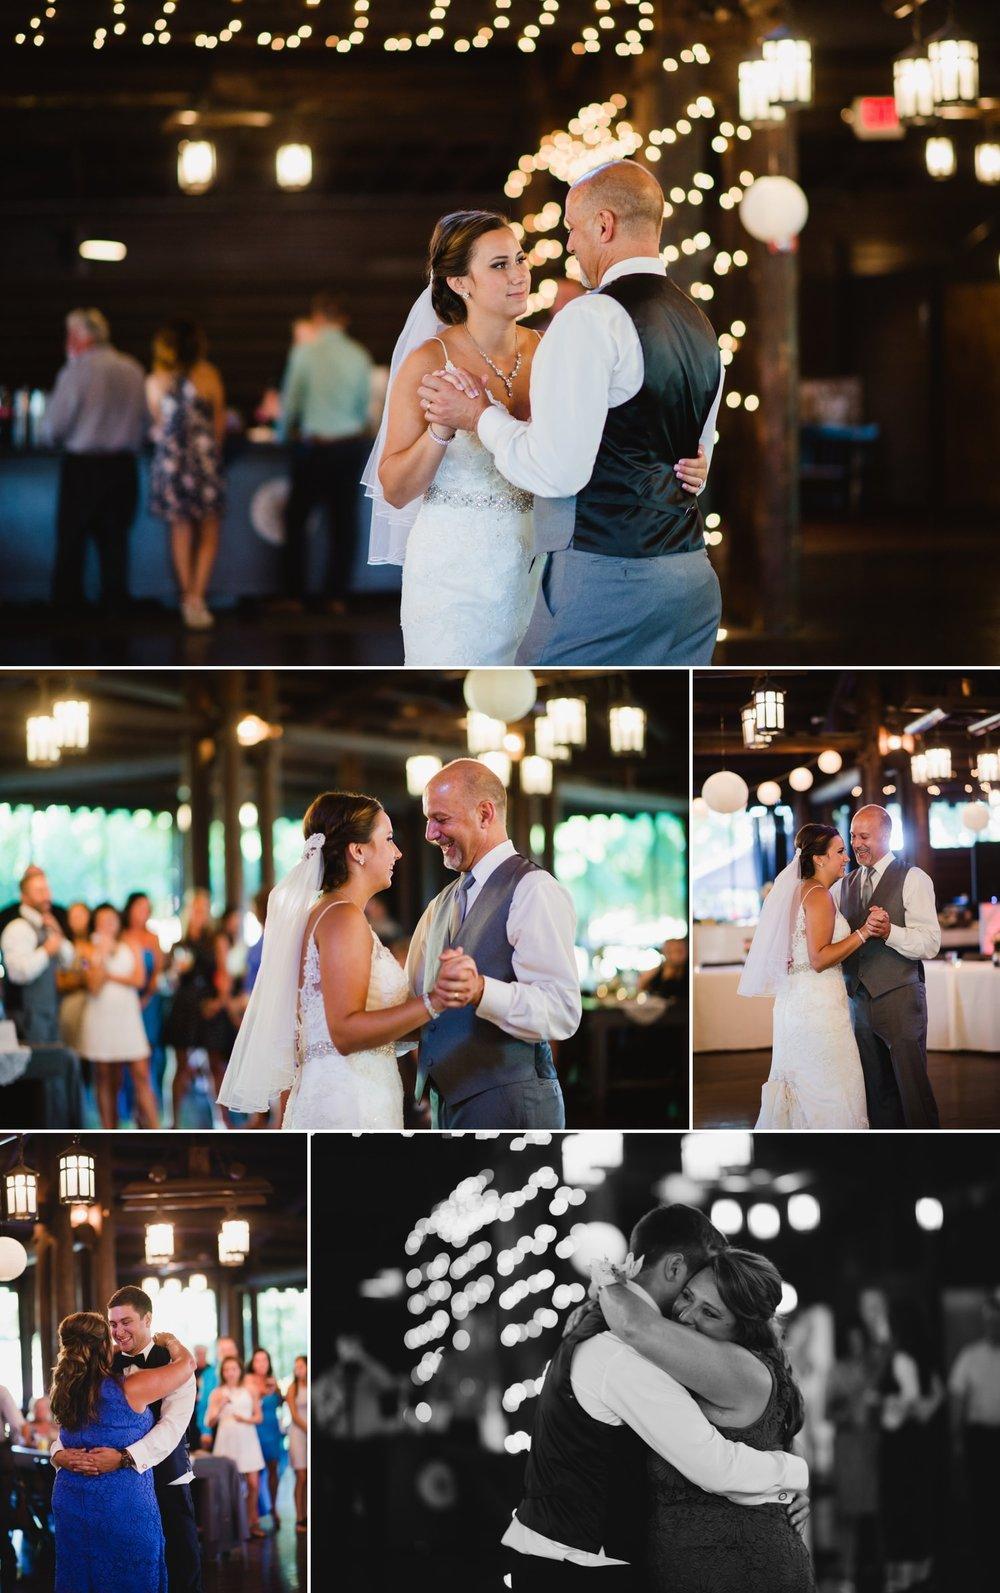 Heckman Wedding Blog 19.jpg